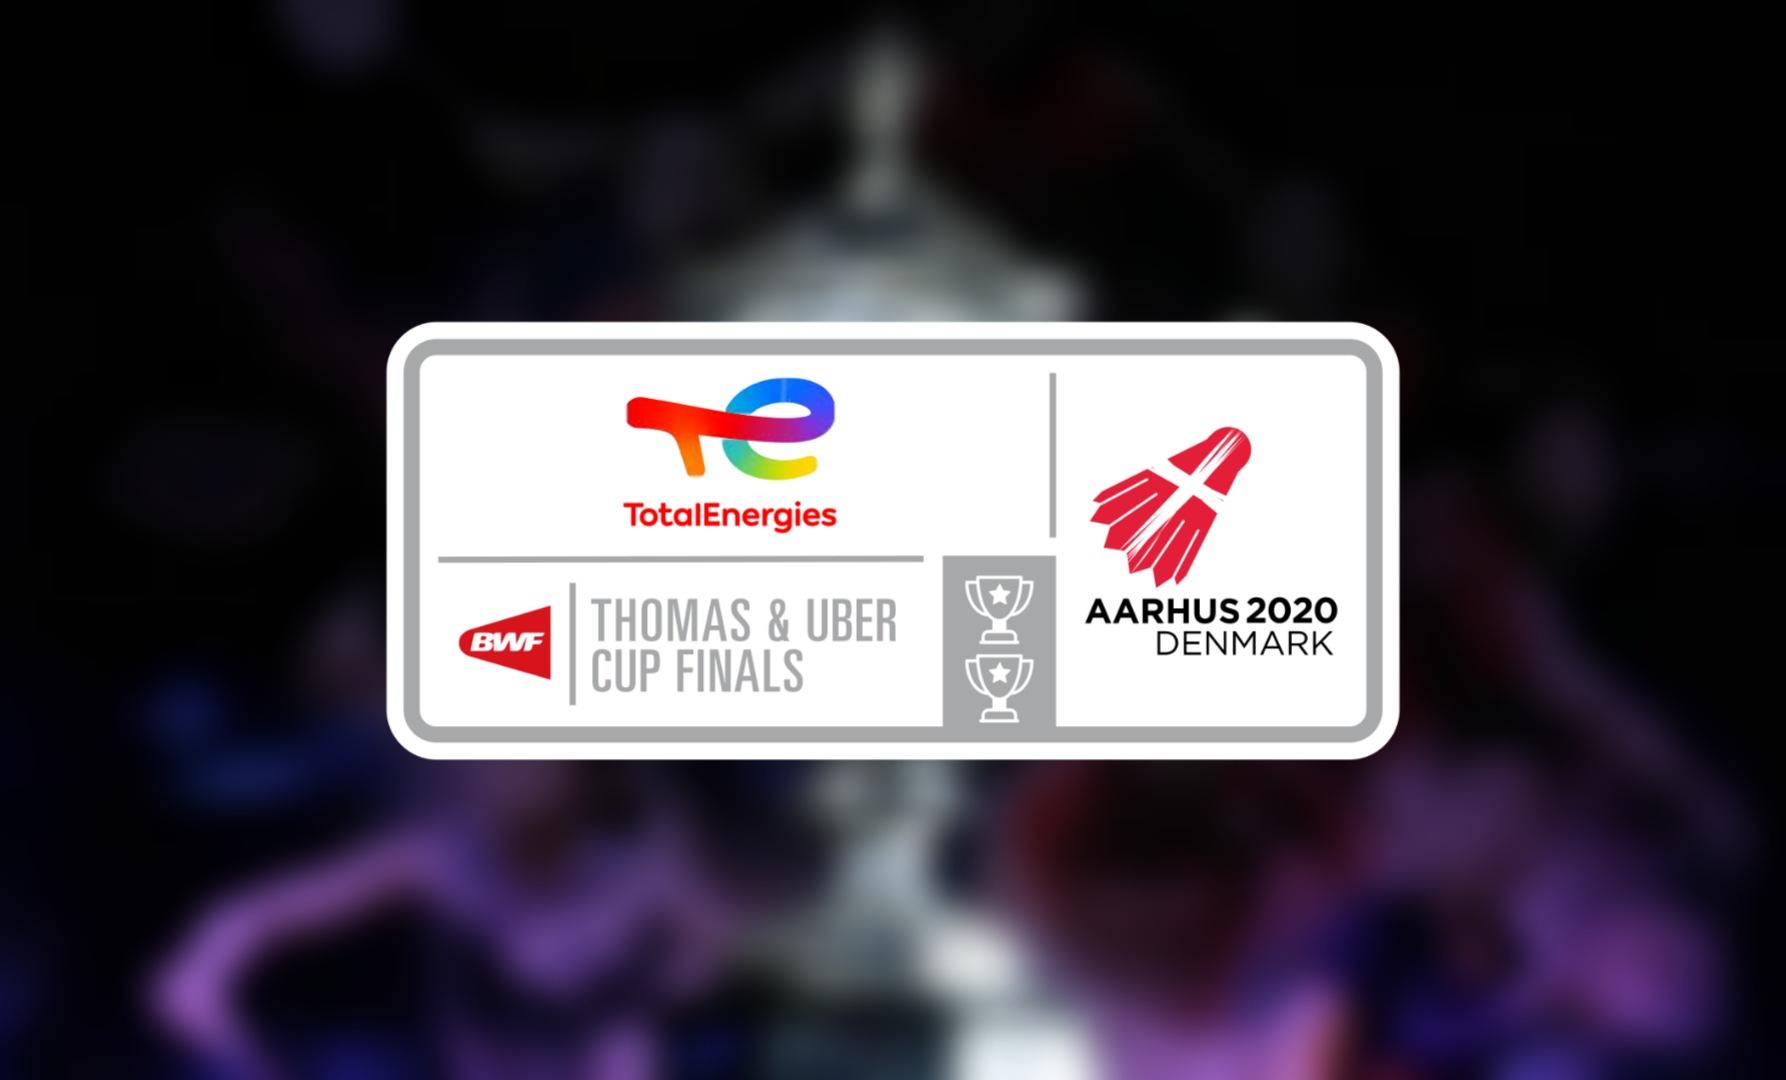 Jadual Siaran Langsung Piala Thomas 2020/2021 Waktu Malaysia (RTM & ASTRO)